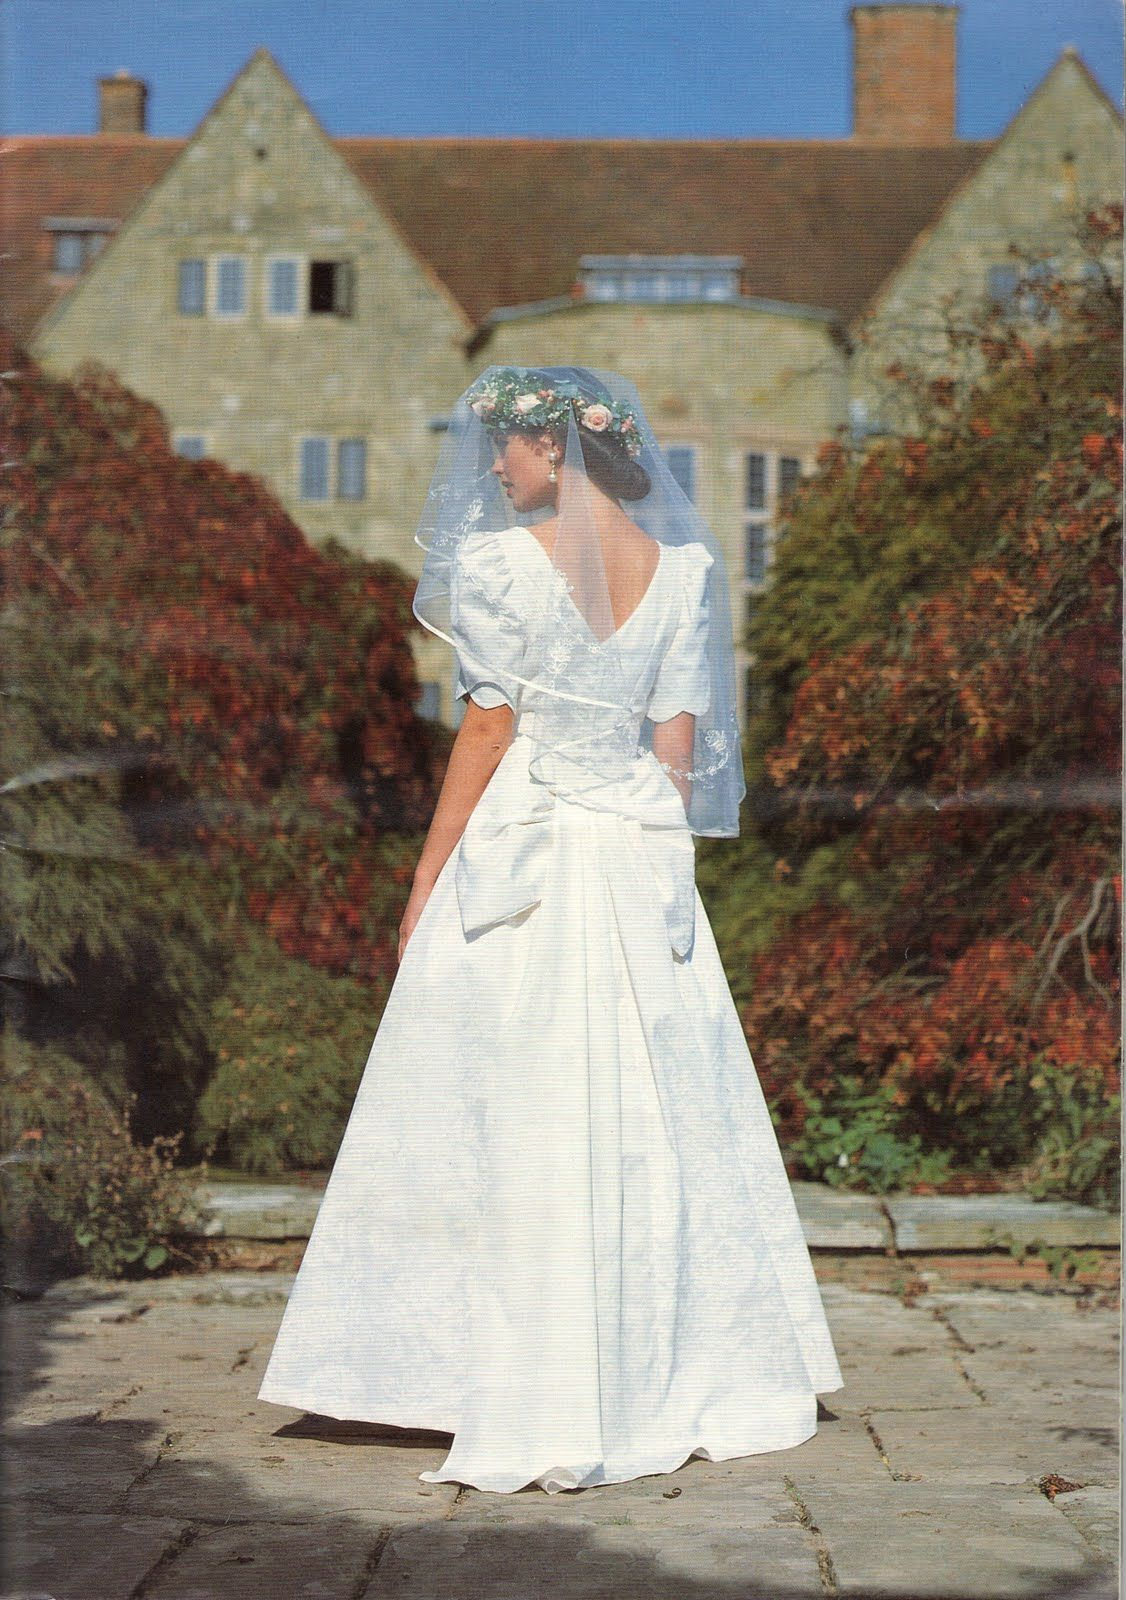 Spriggs Florist Wedding Flowers For Laura Ashley Circa 1993 Laura Ashley Wedding Dress Laura Ashley Fashion Laura Ashley Dress